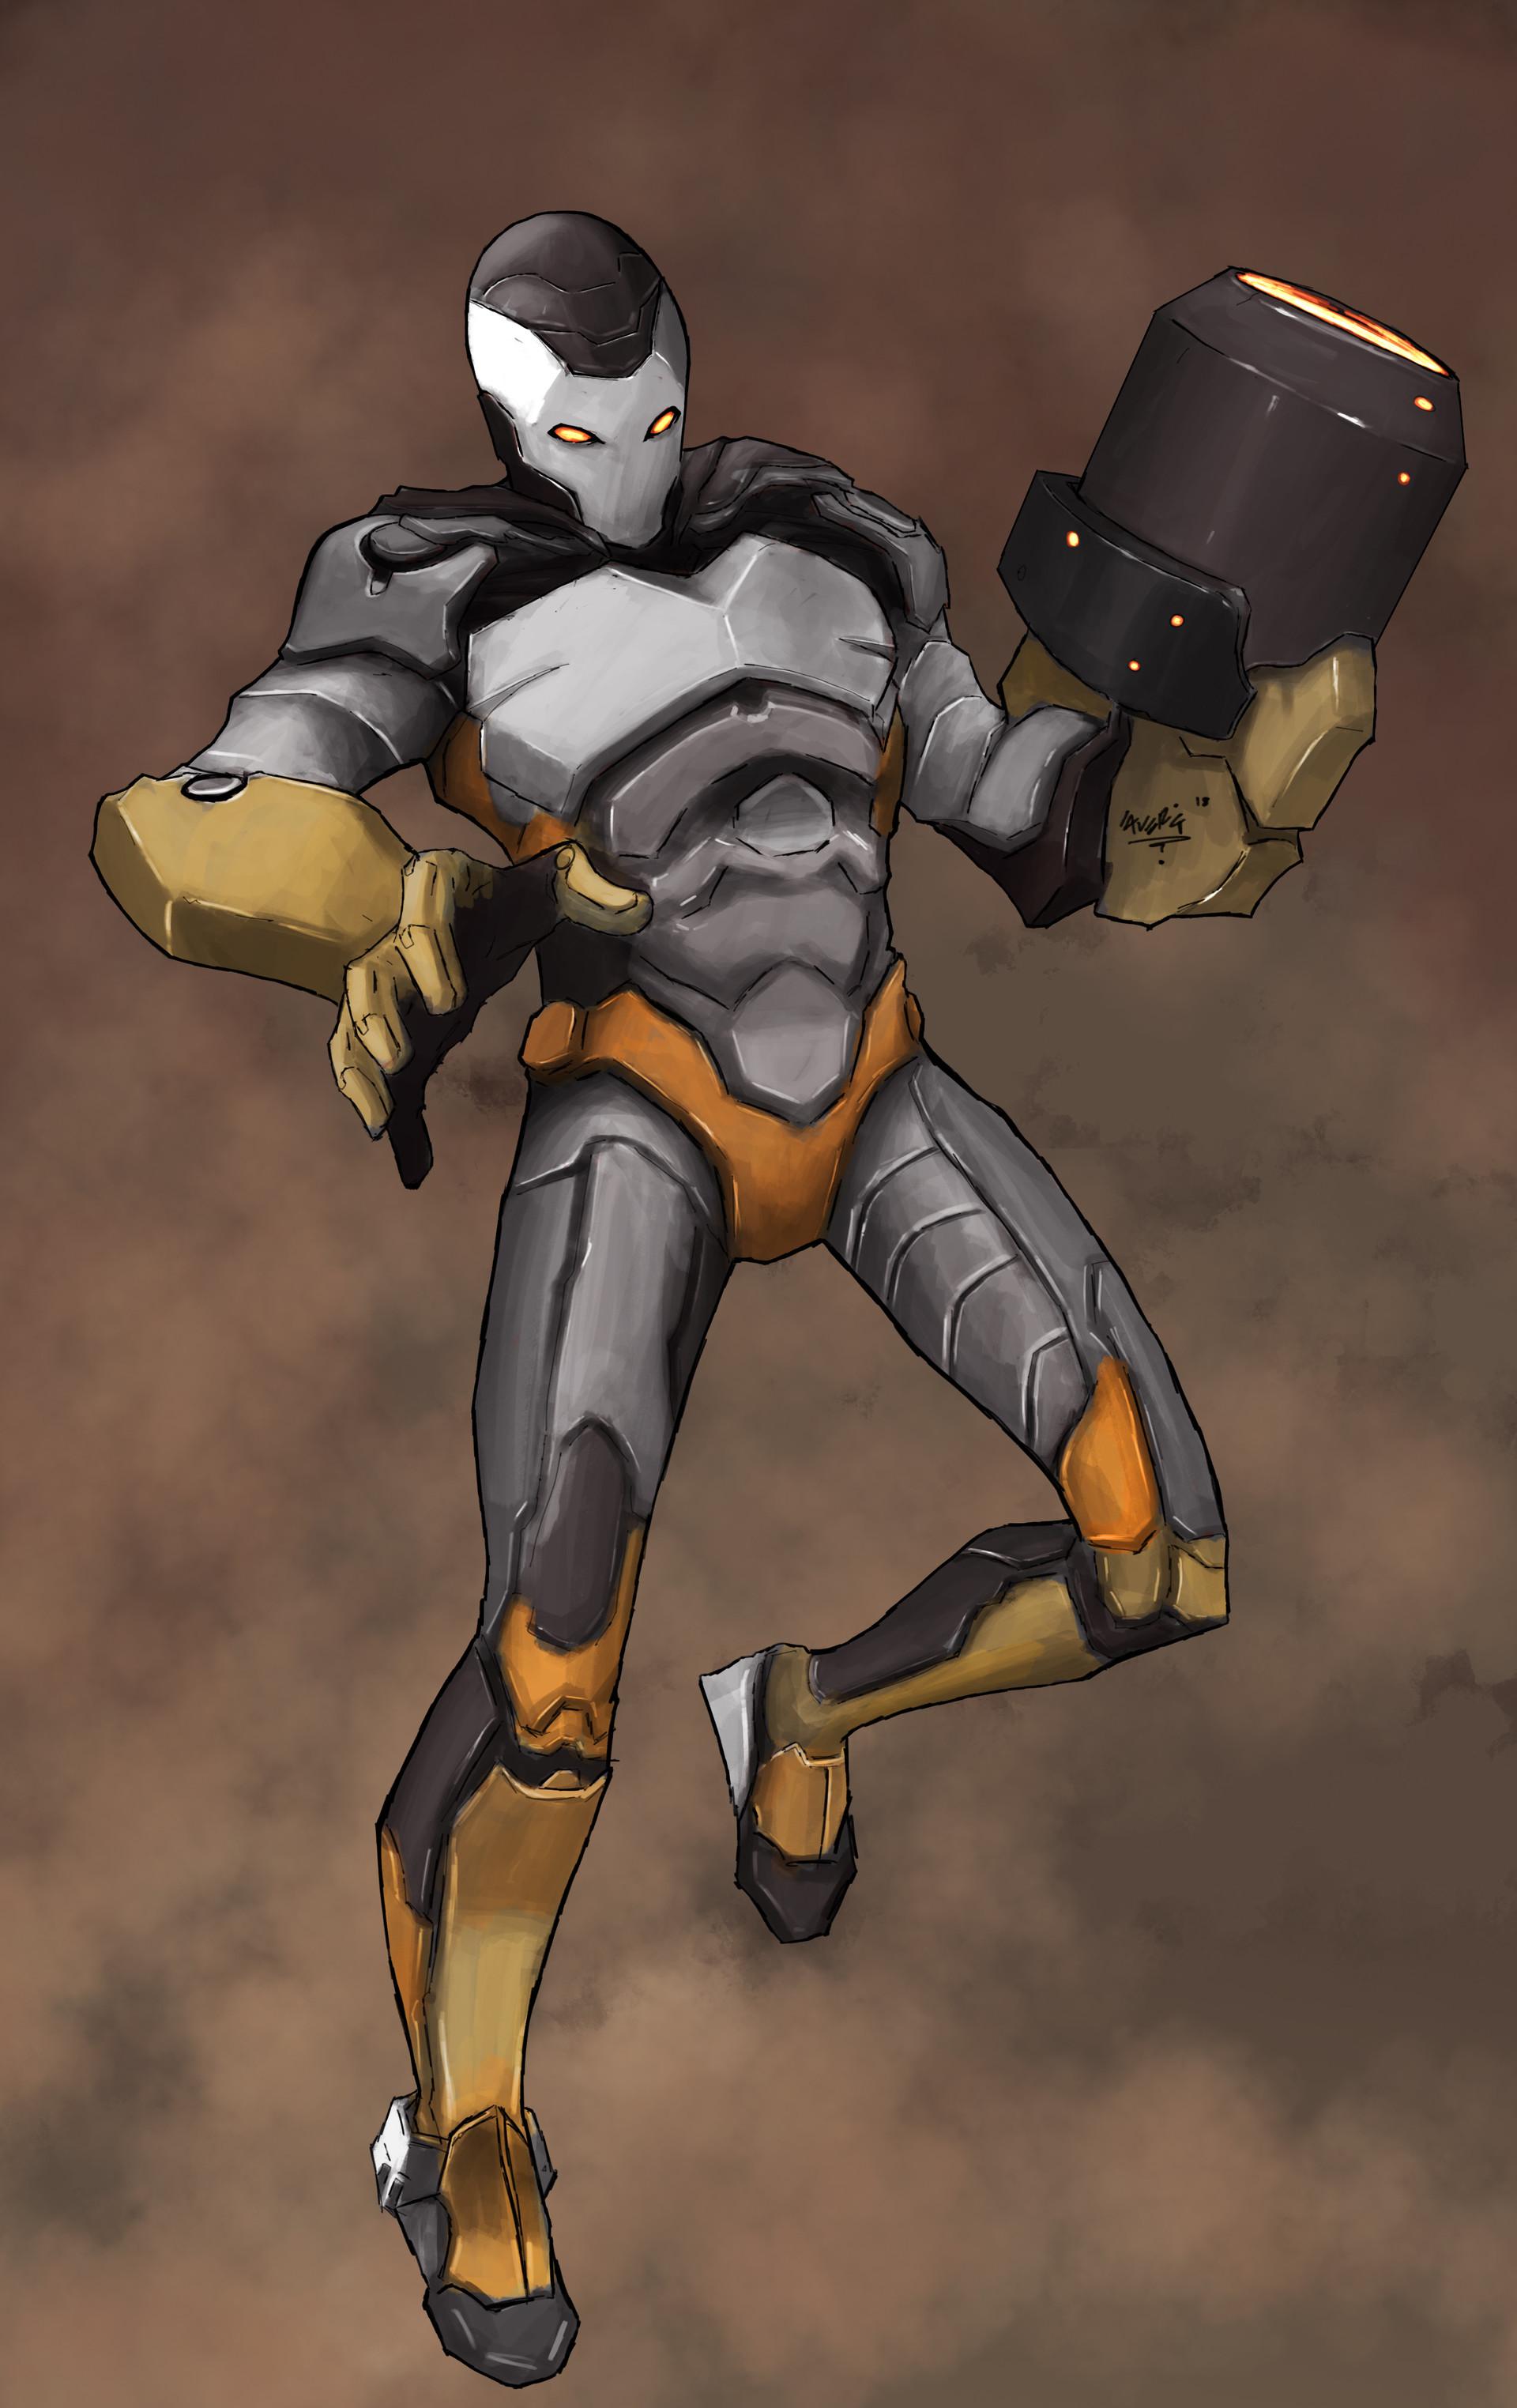 Gbenle maverick cyborg ig work 2